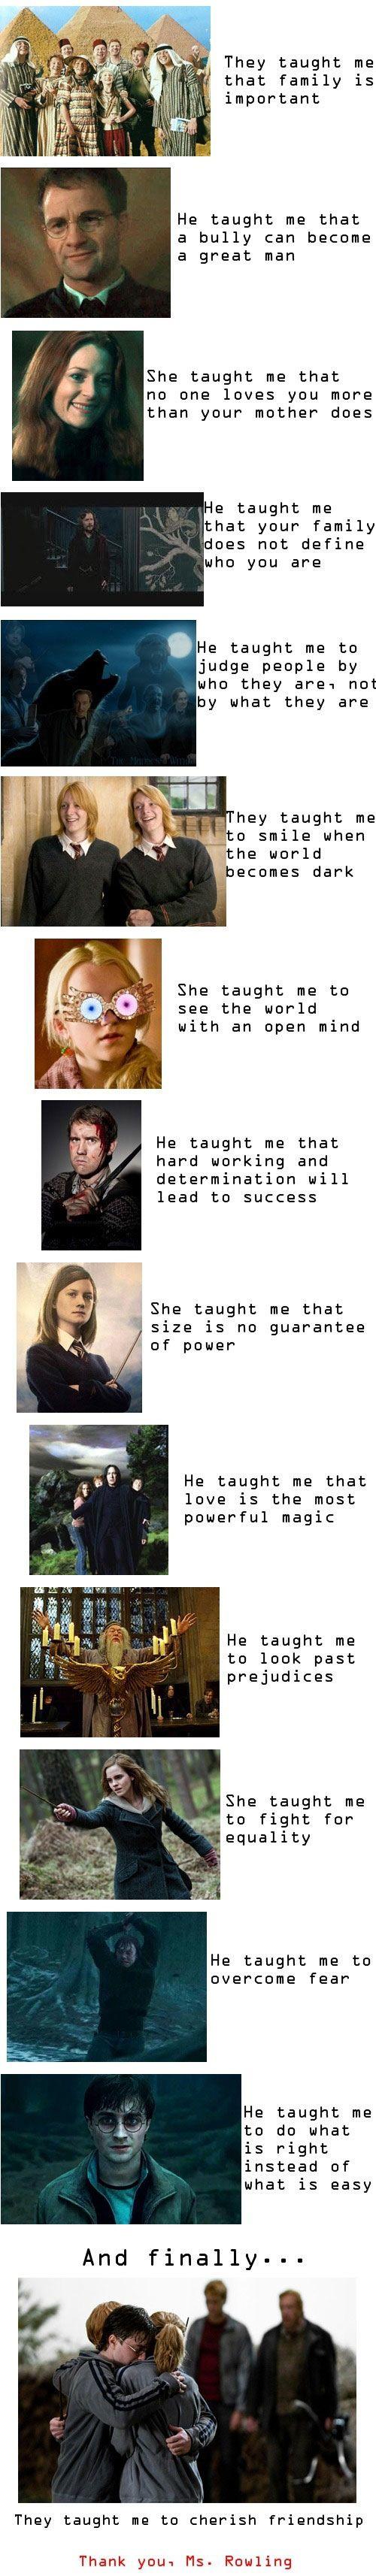 The Teachings Of JK Rowling